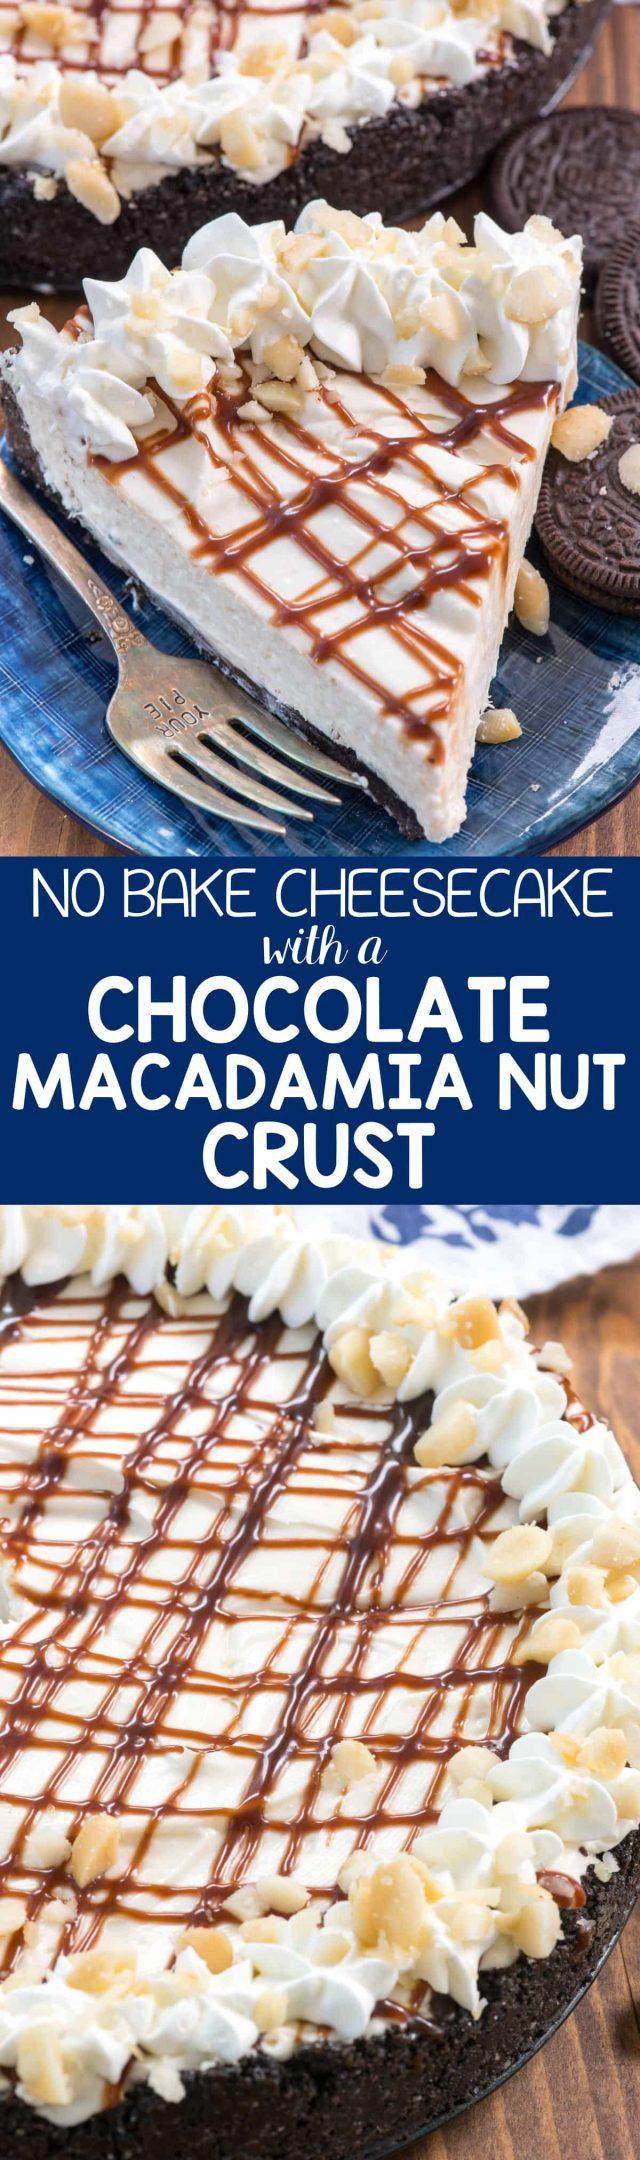 The PERFECT No Bake Cheesecake with Chocolate Macadamia Nut Crust! This easy cheesecake recipe is perfect with an oreo crust filled with macadamia nuts. No bake means the perfect for summer recipe!